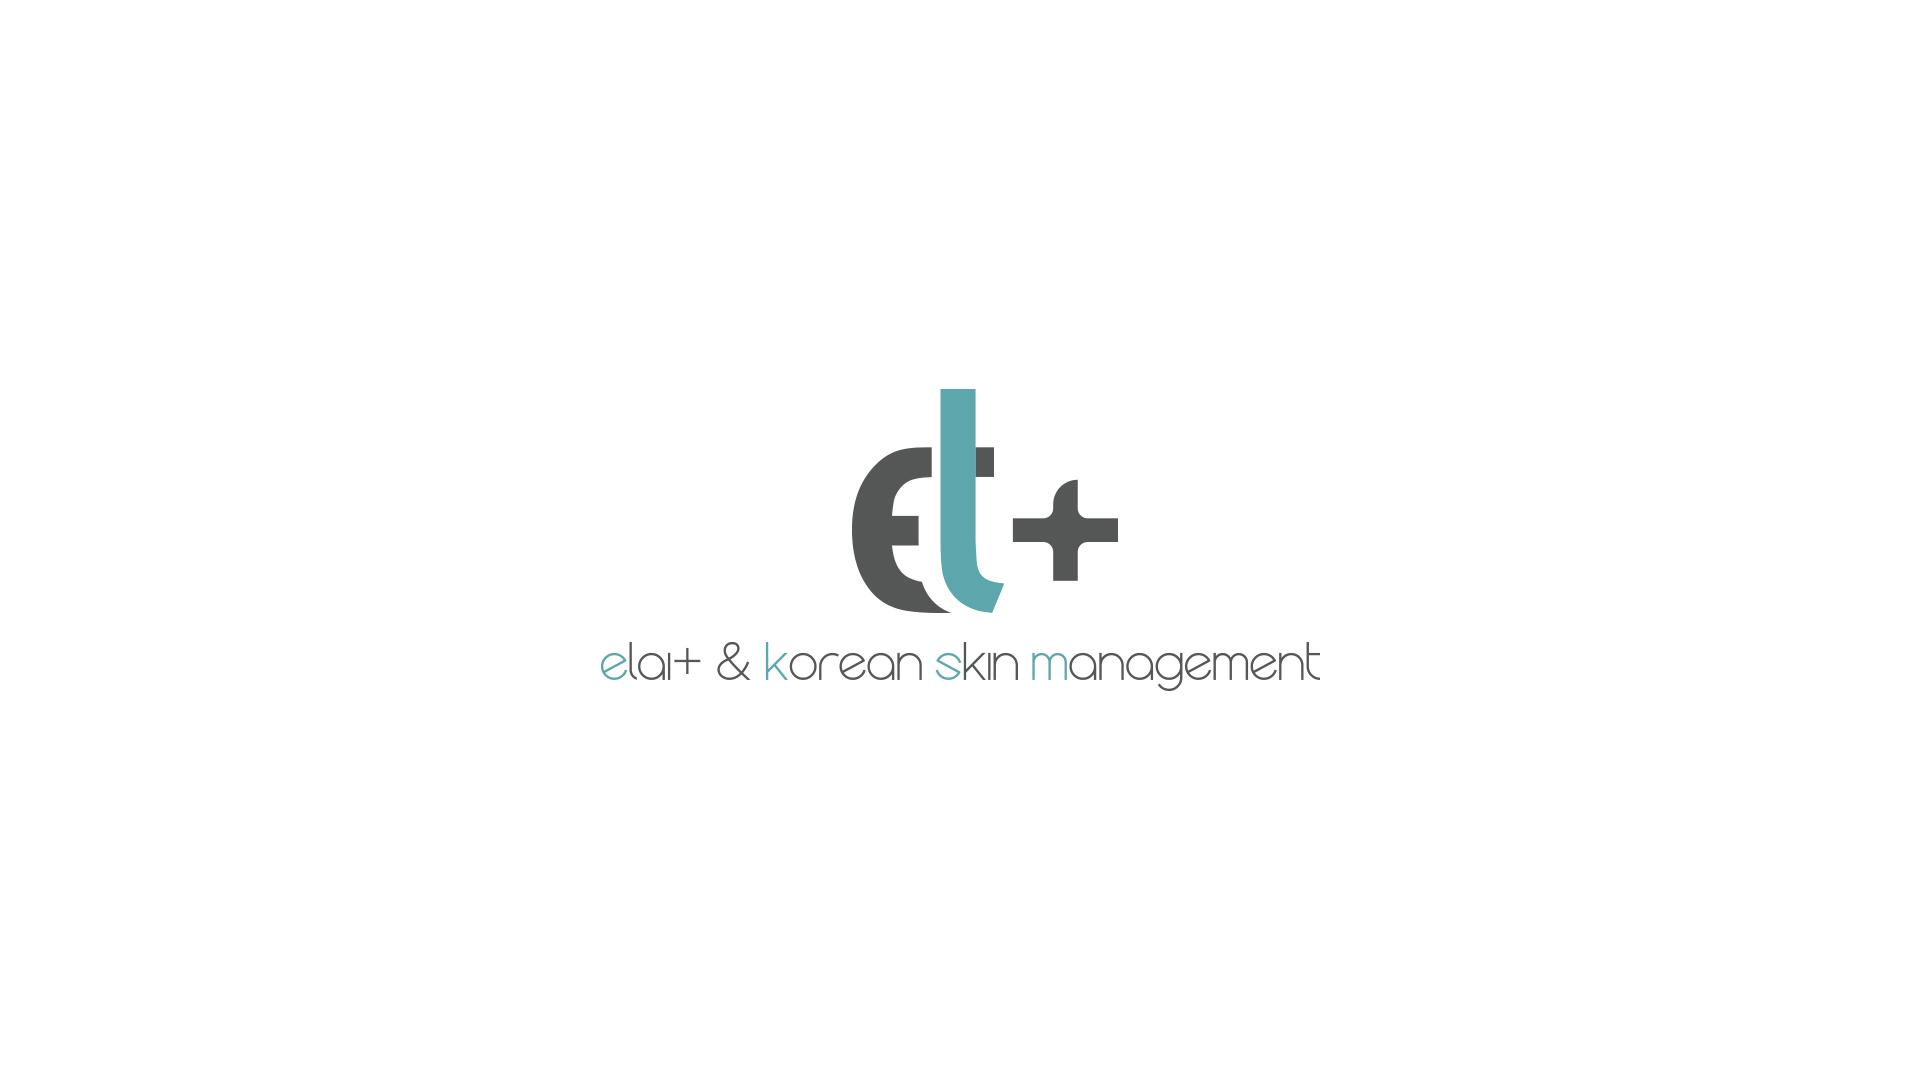 ELAI韩式皮肤管理logo设计